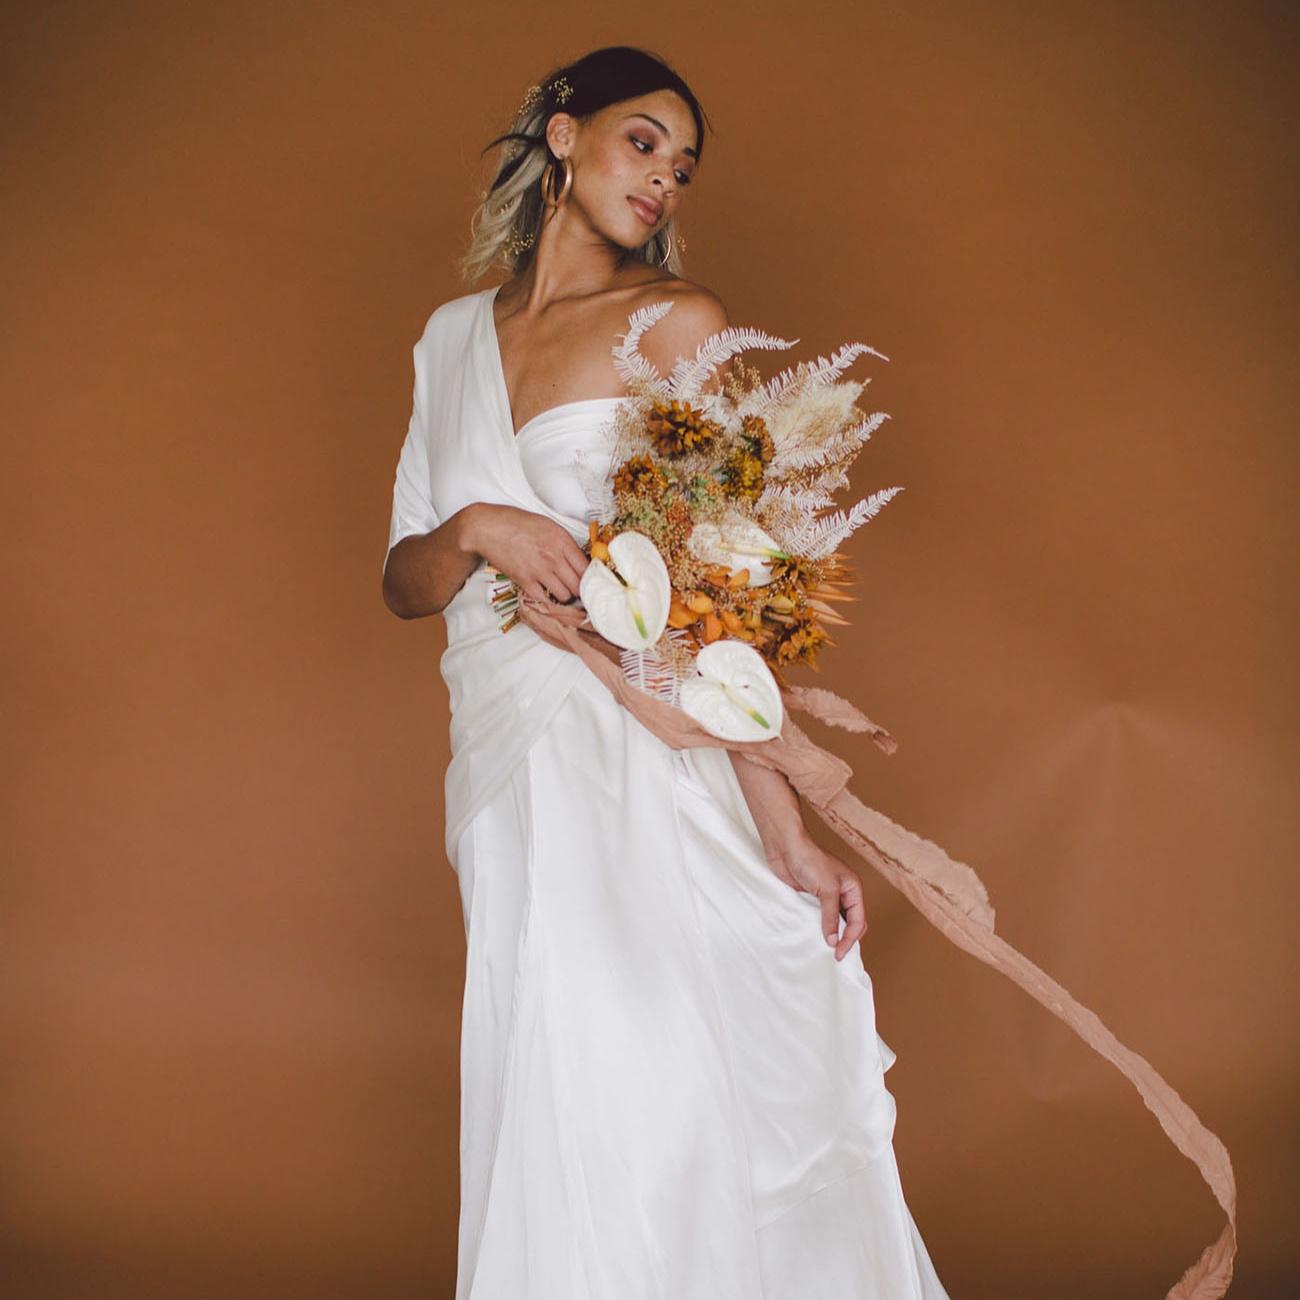 modern + free spirited editorial - featured ongreen wedding shoes